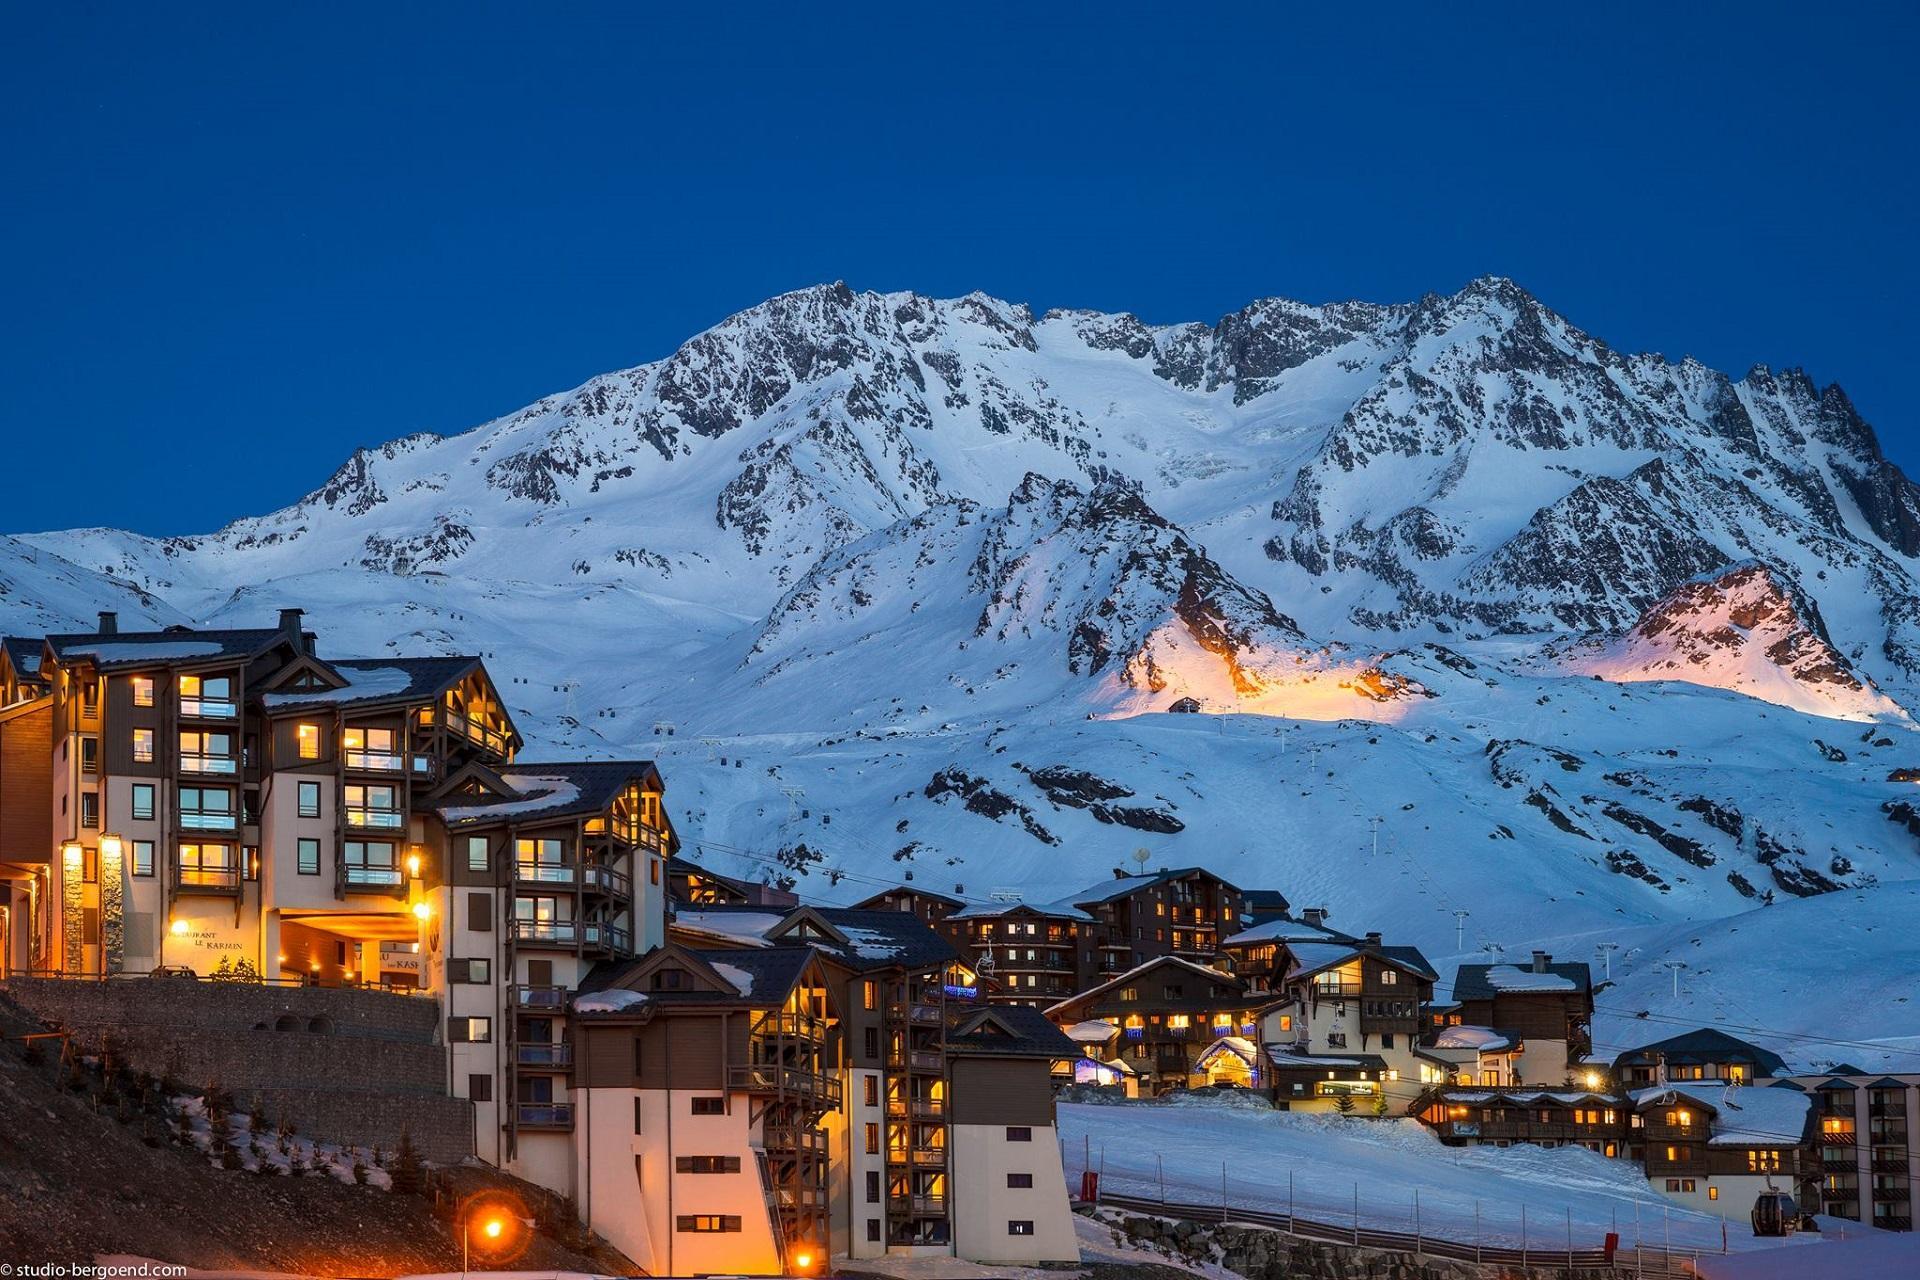 le-hameau-du-kashmir-val-thorens-montagnettes-ski-neige-nuit